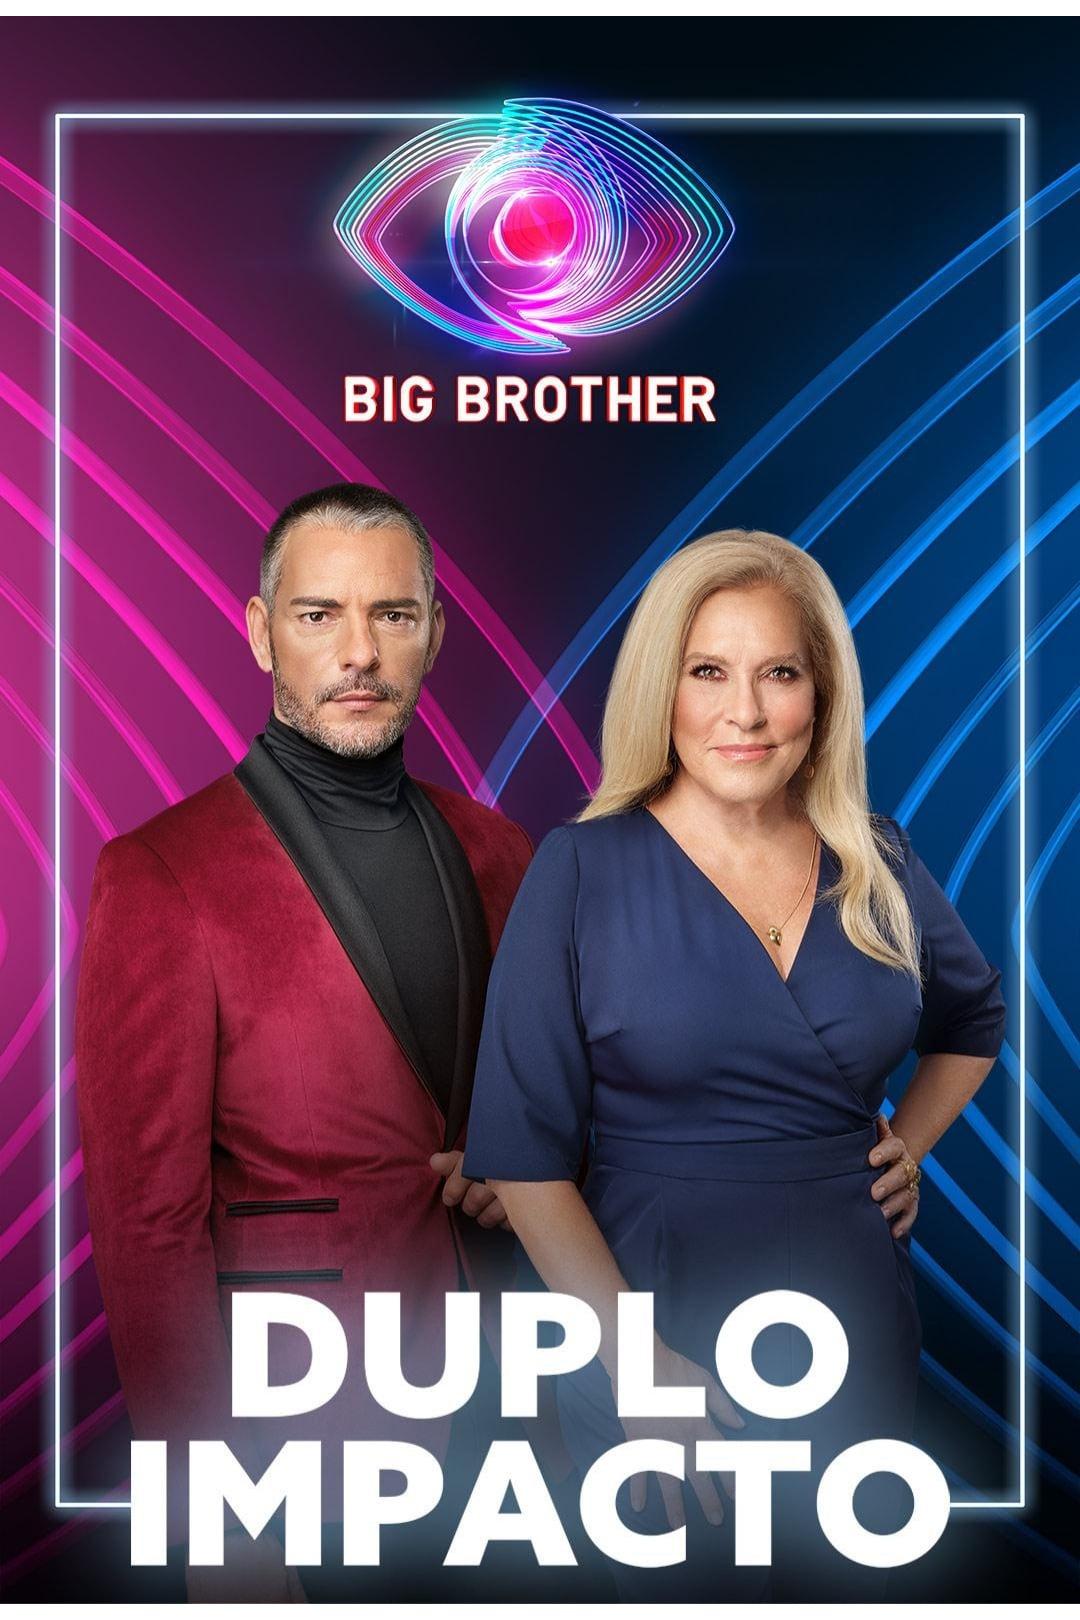 Big Brother Season 7